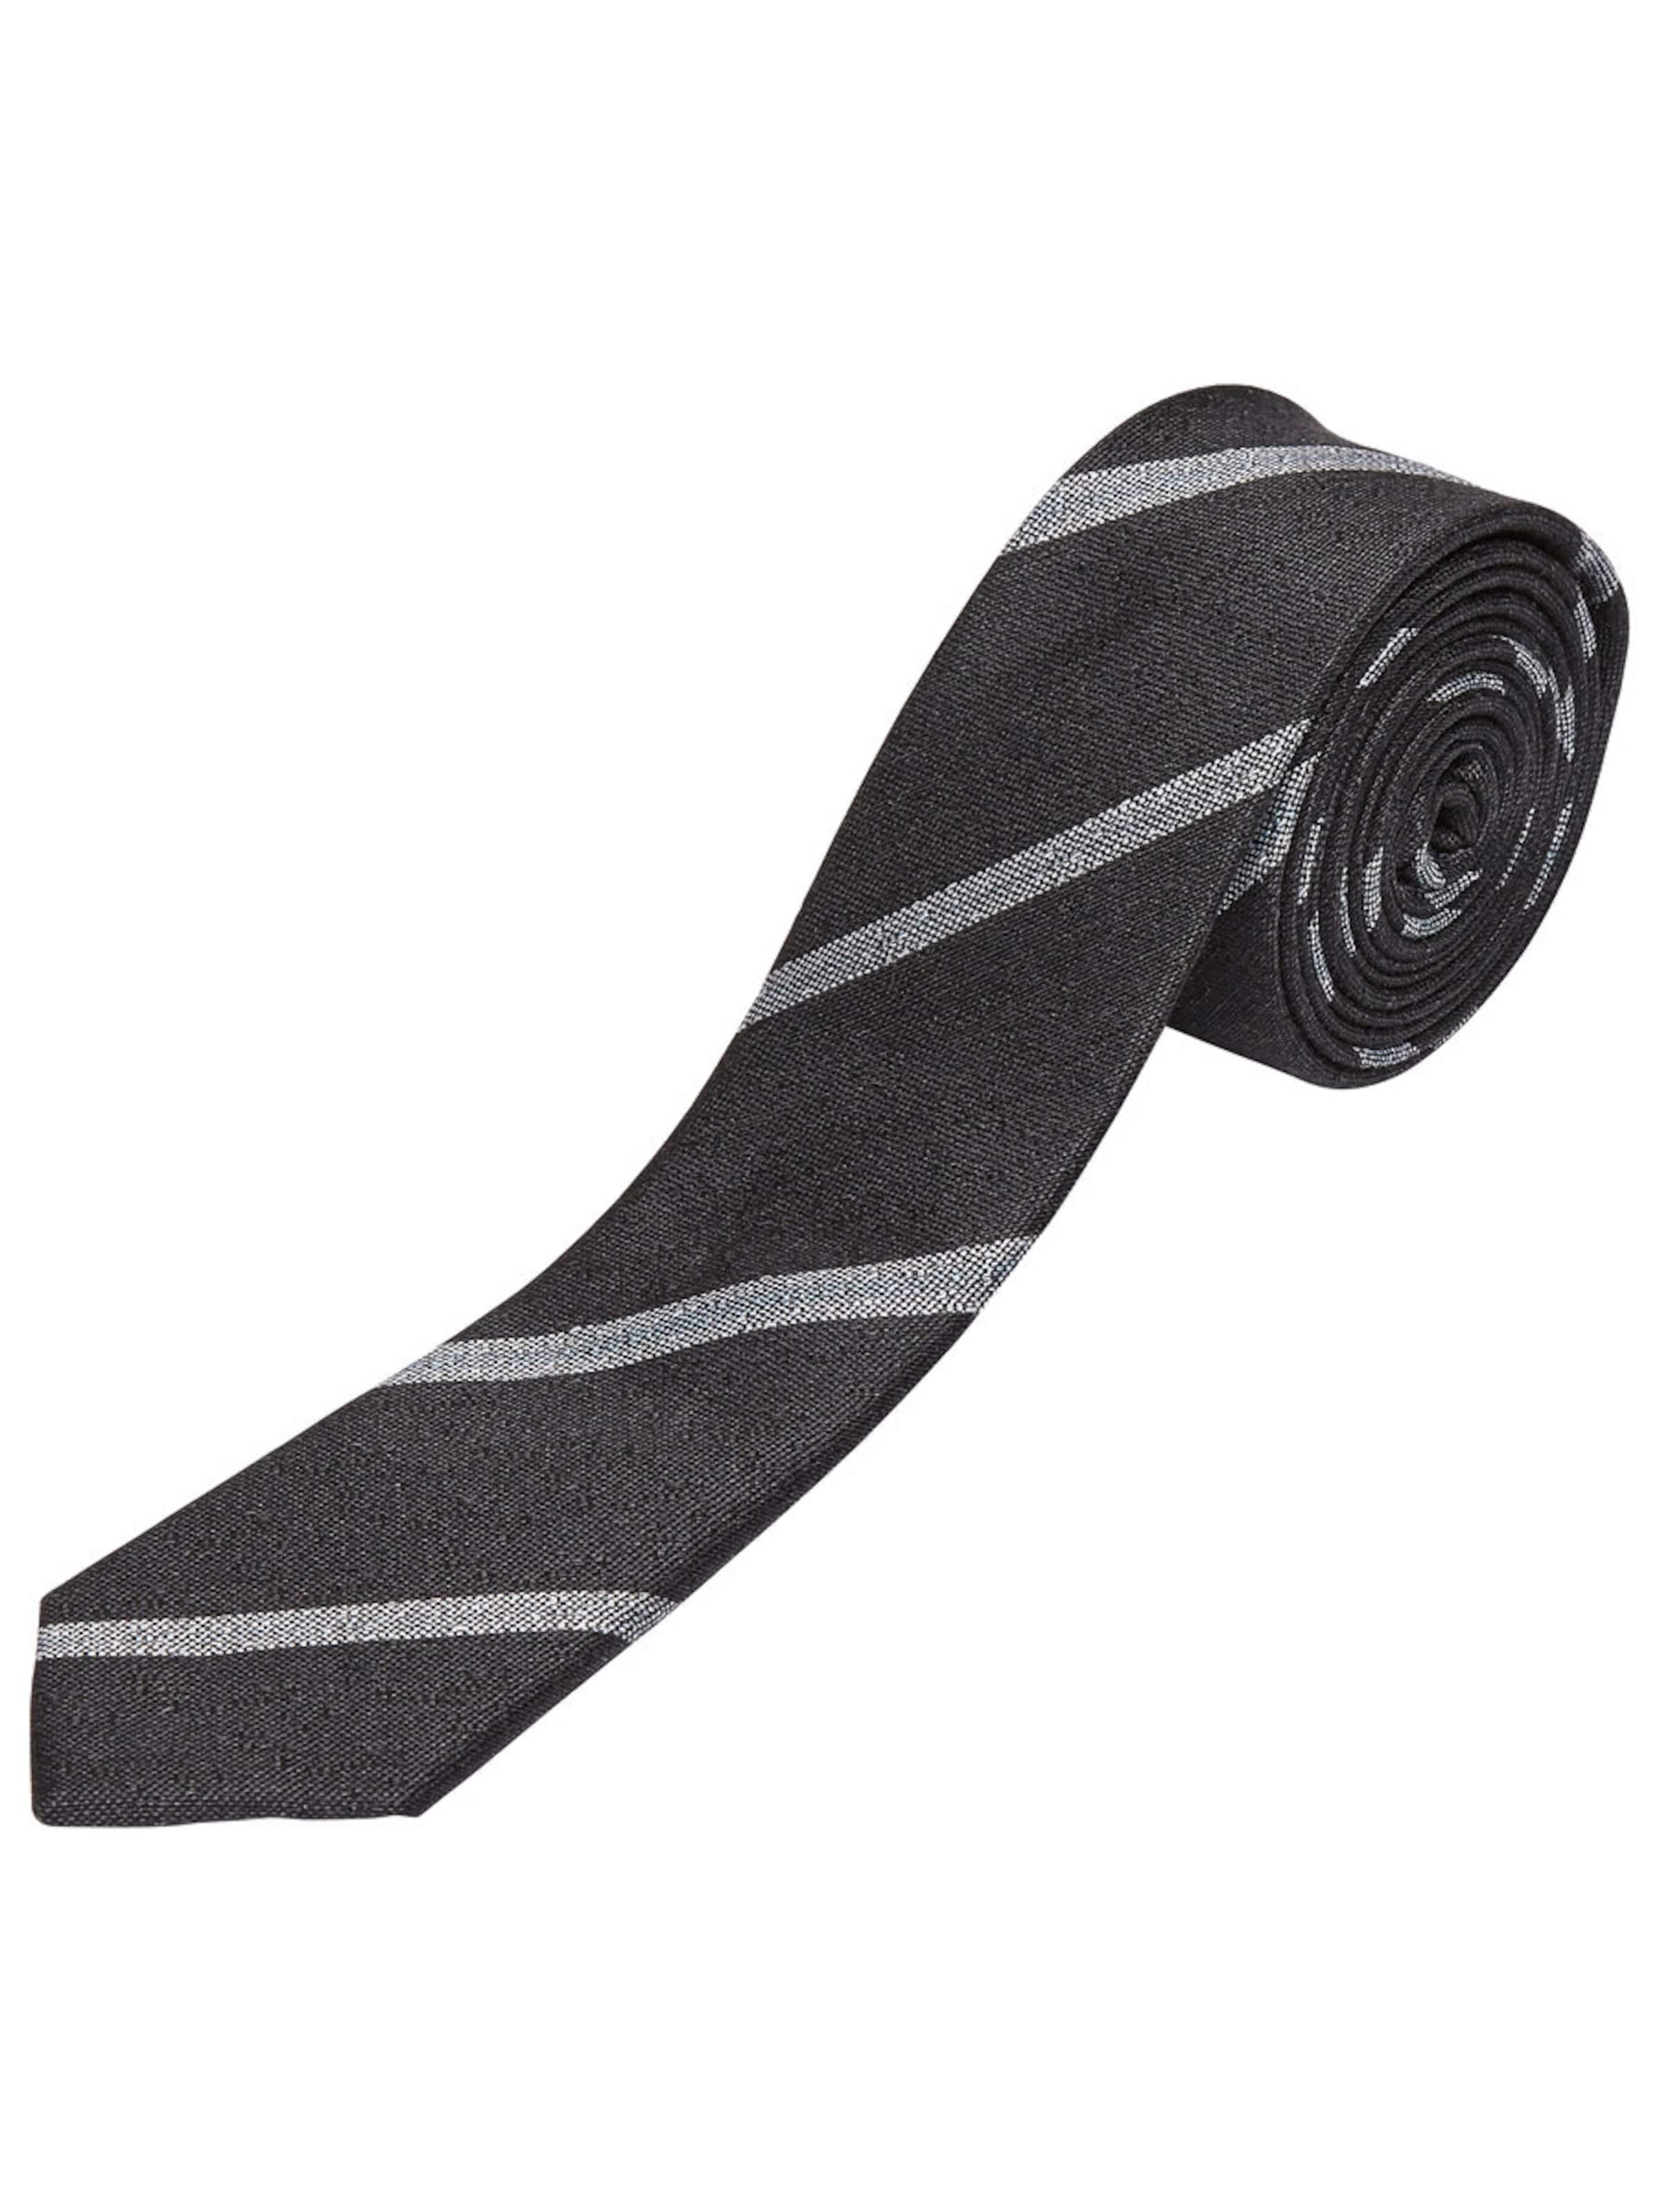 SELECTED HOMME Krawatte Rabatt Visum Zahlung Verkaufsstelle Rabatt Beste Offizieller Günstiger Preis l9tFV